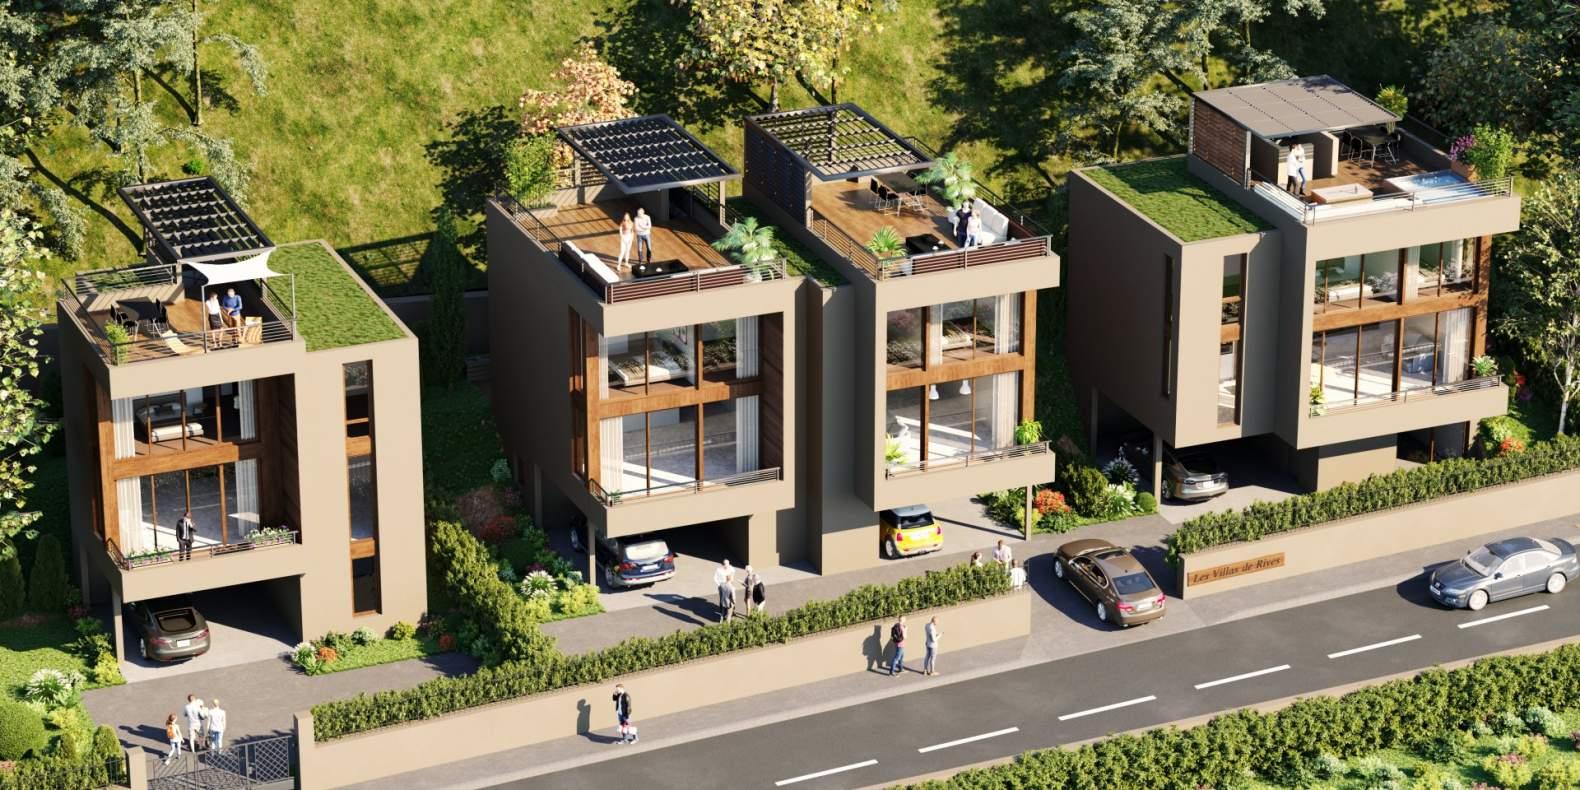 Thonon-les-Bains  - Casa 7 Cuartos 6 Habitaciones - picture 3